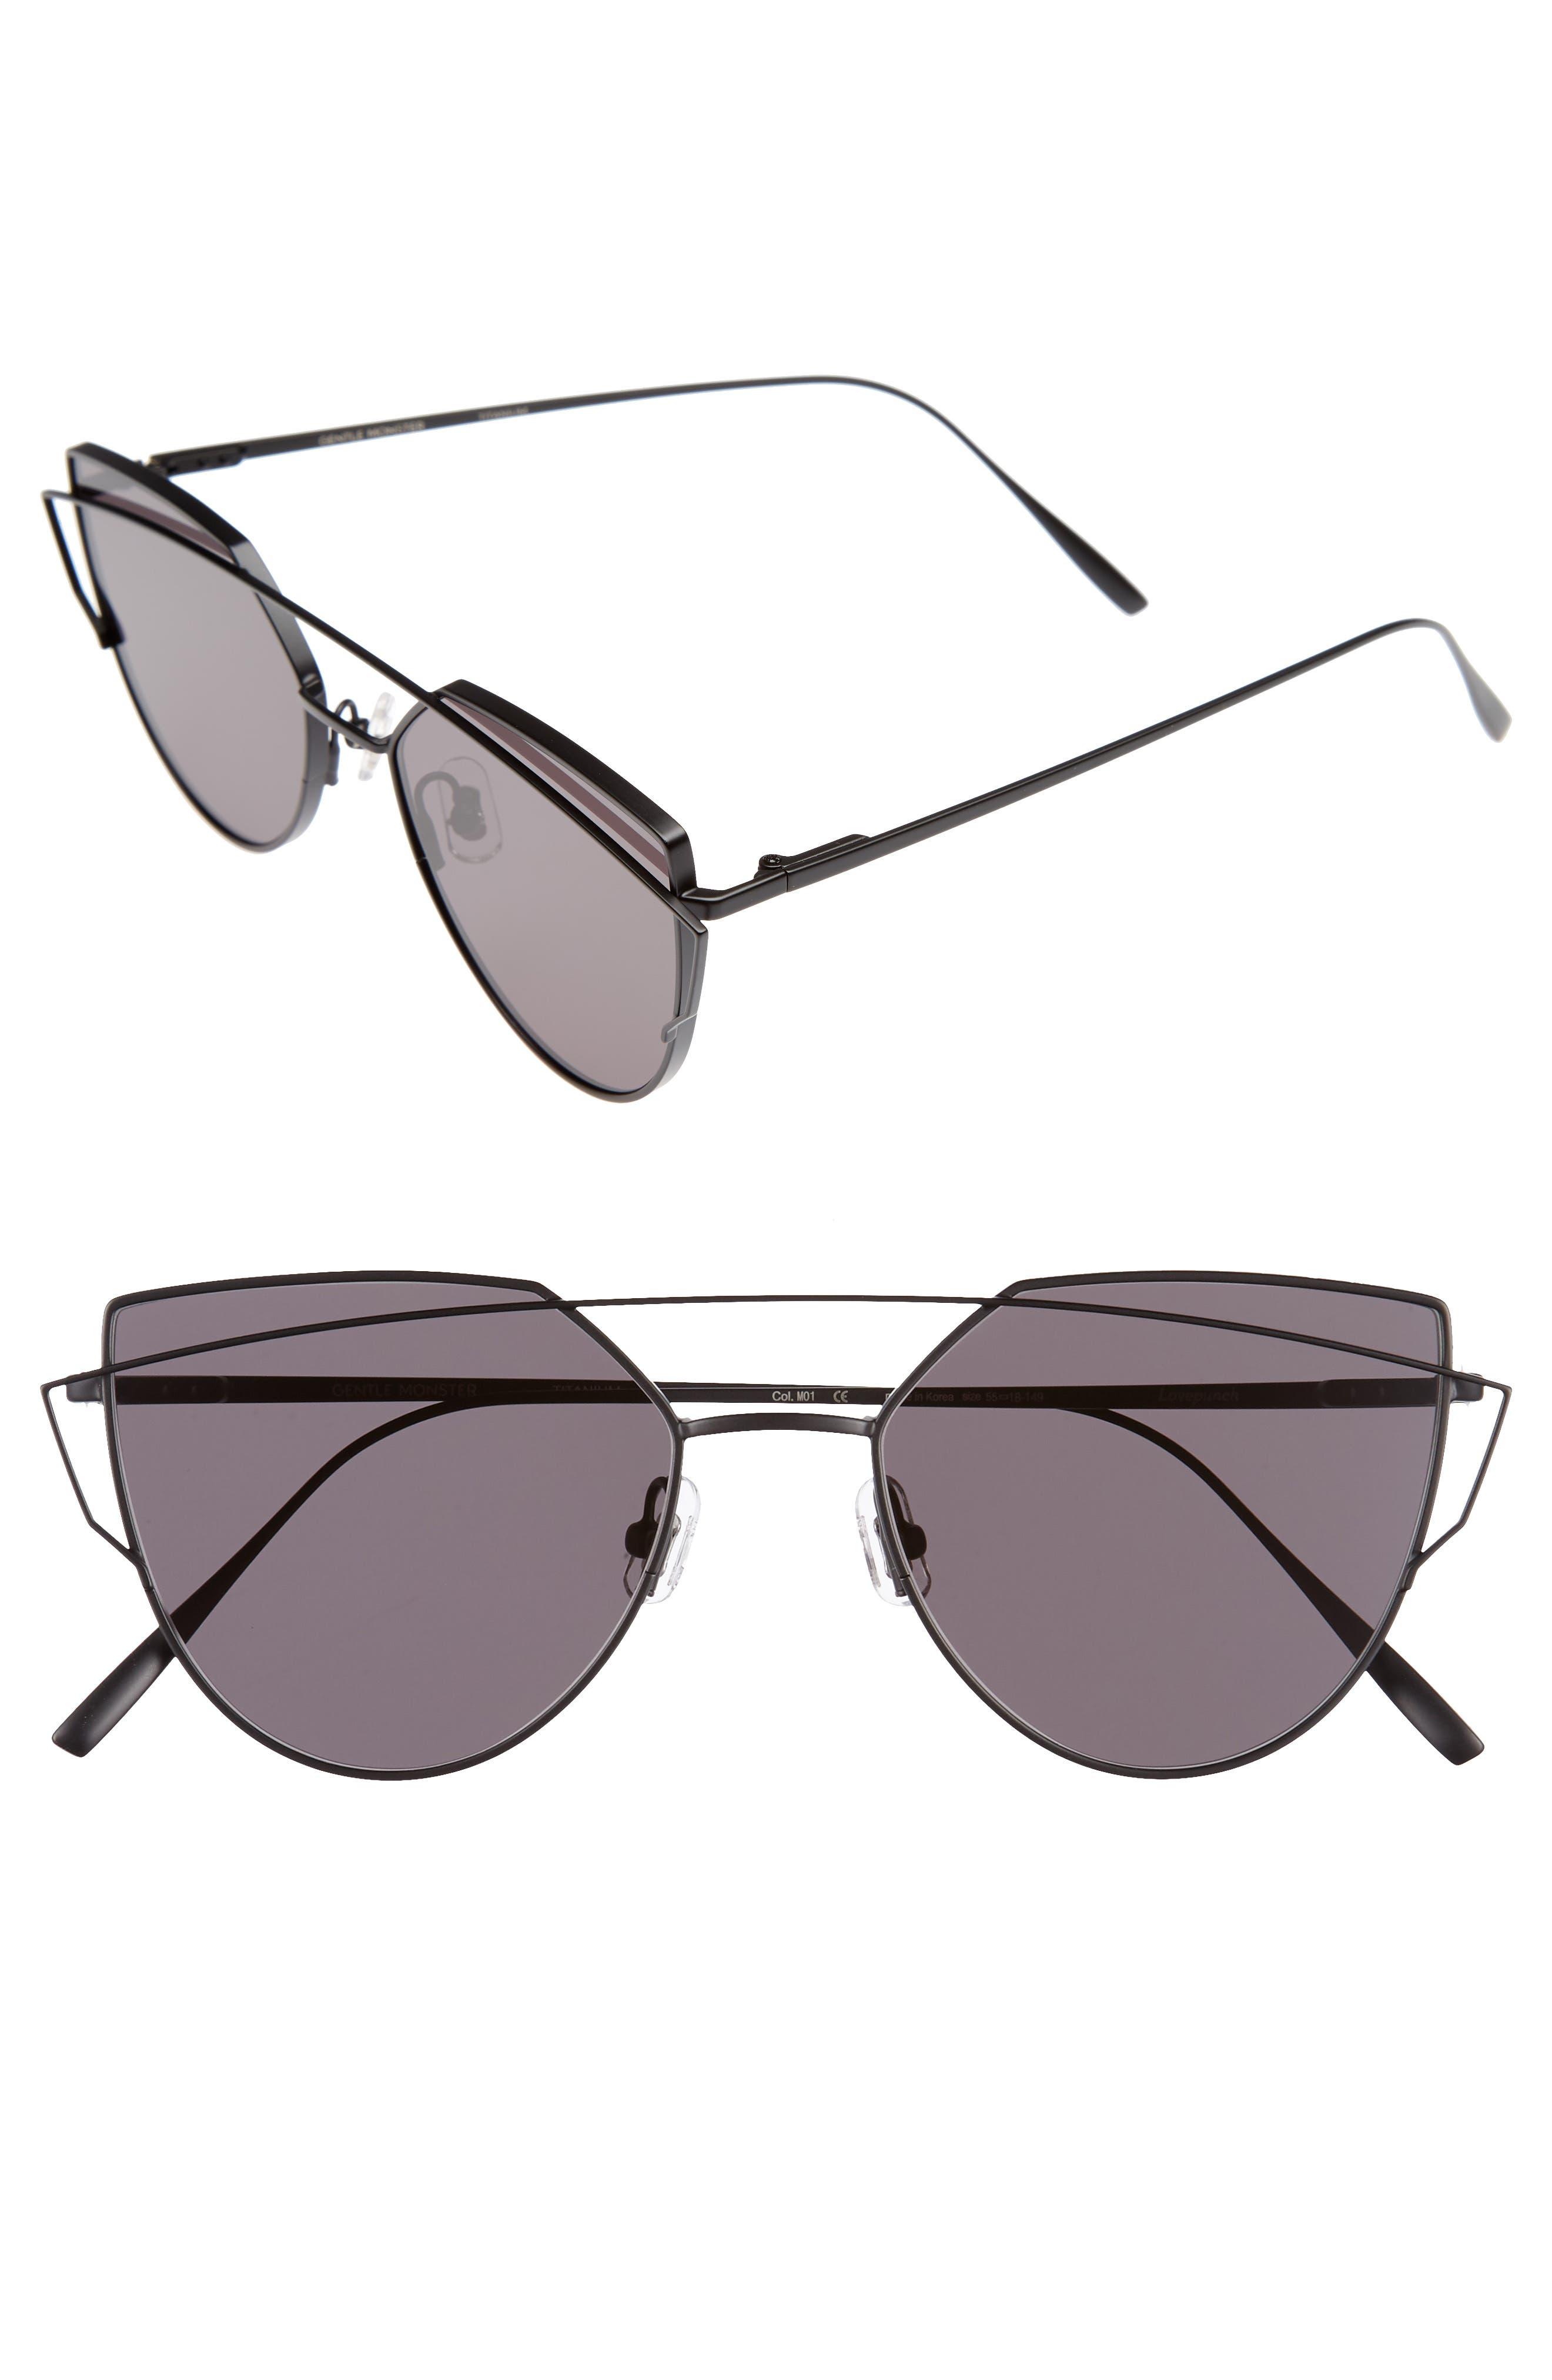 8ac89efd055b GENTLE MONSTER Love Punch 55Mm Titanium Aviator Sunglasses - Matte Black